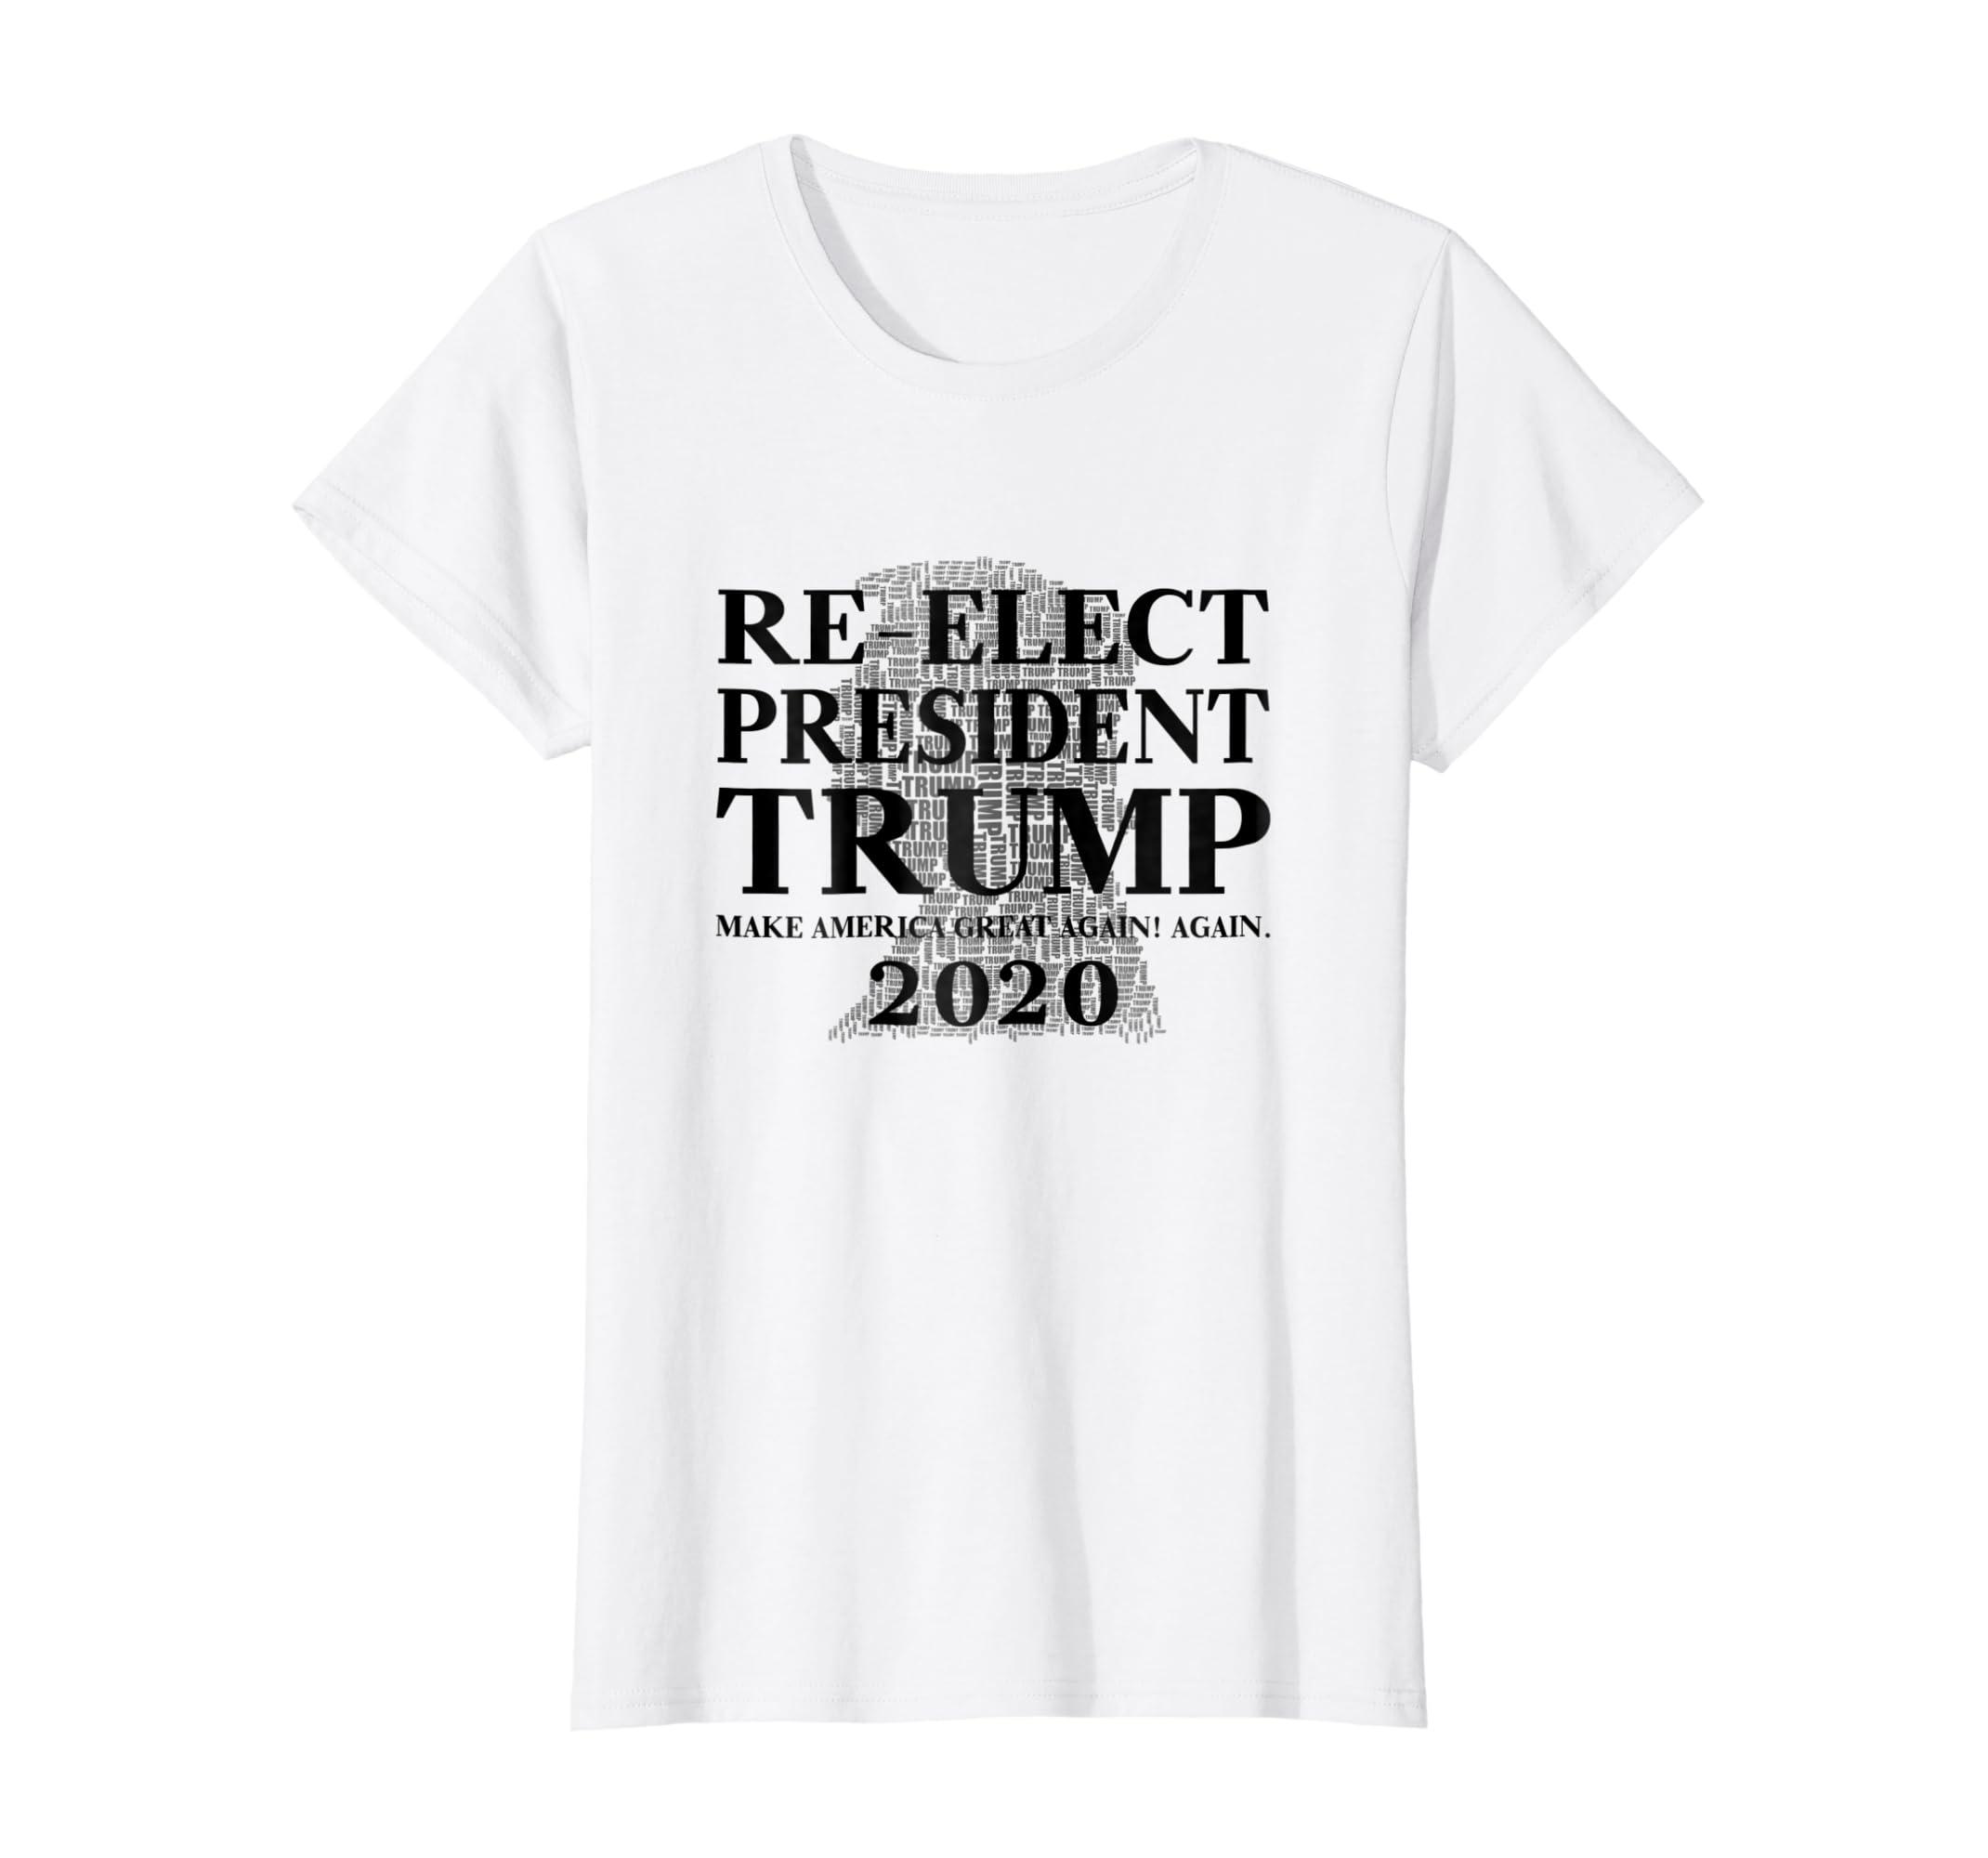 Top Rums 2020.Amazon Com Re Elect Trump 2020 Trump Administration